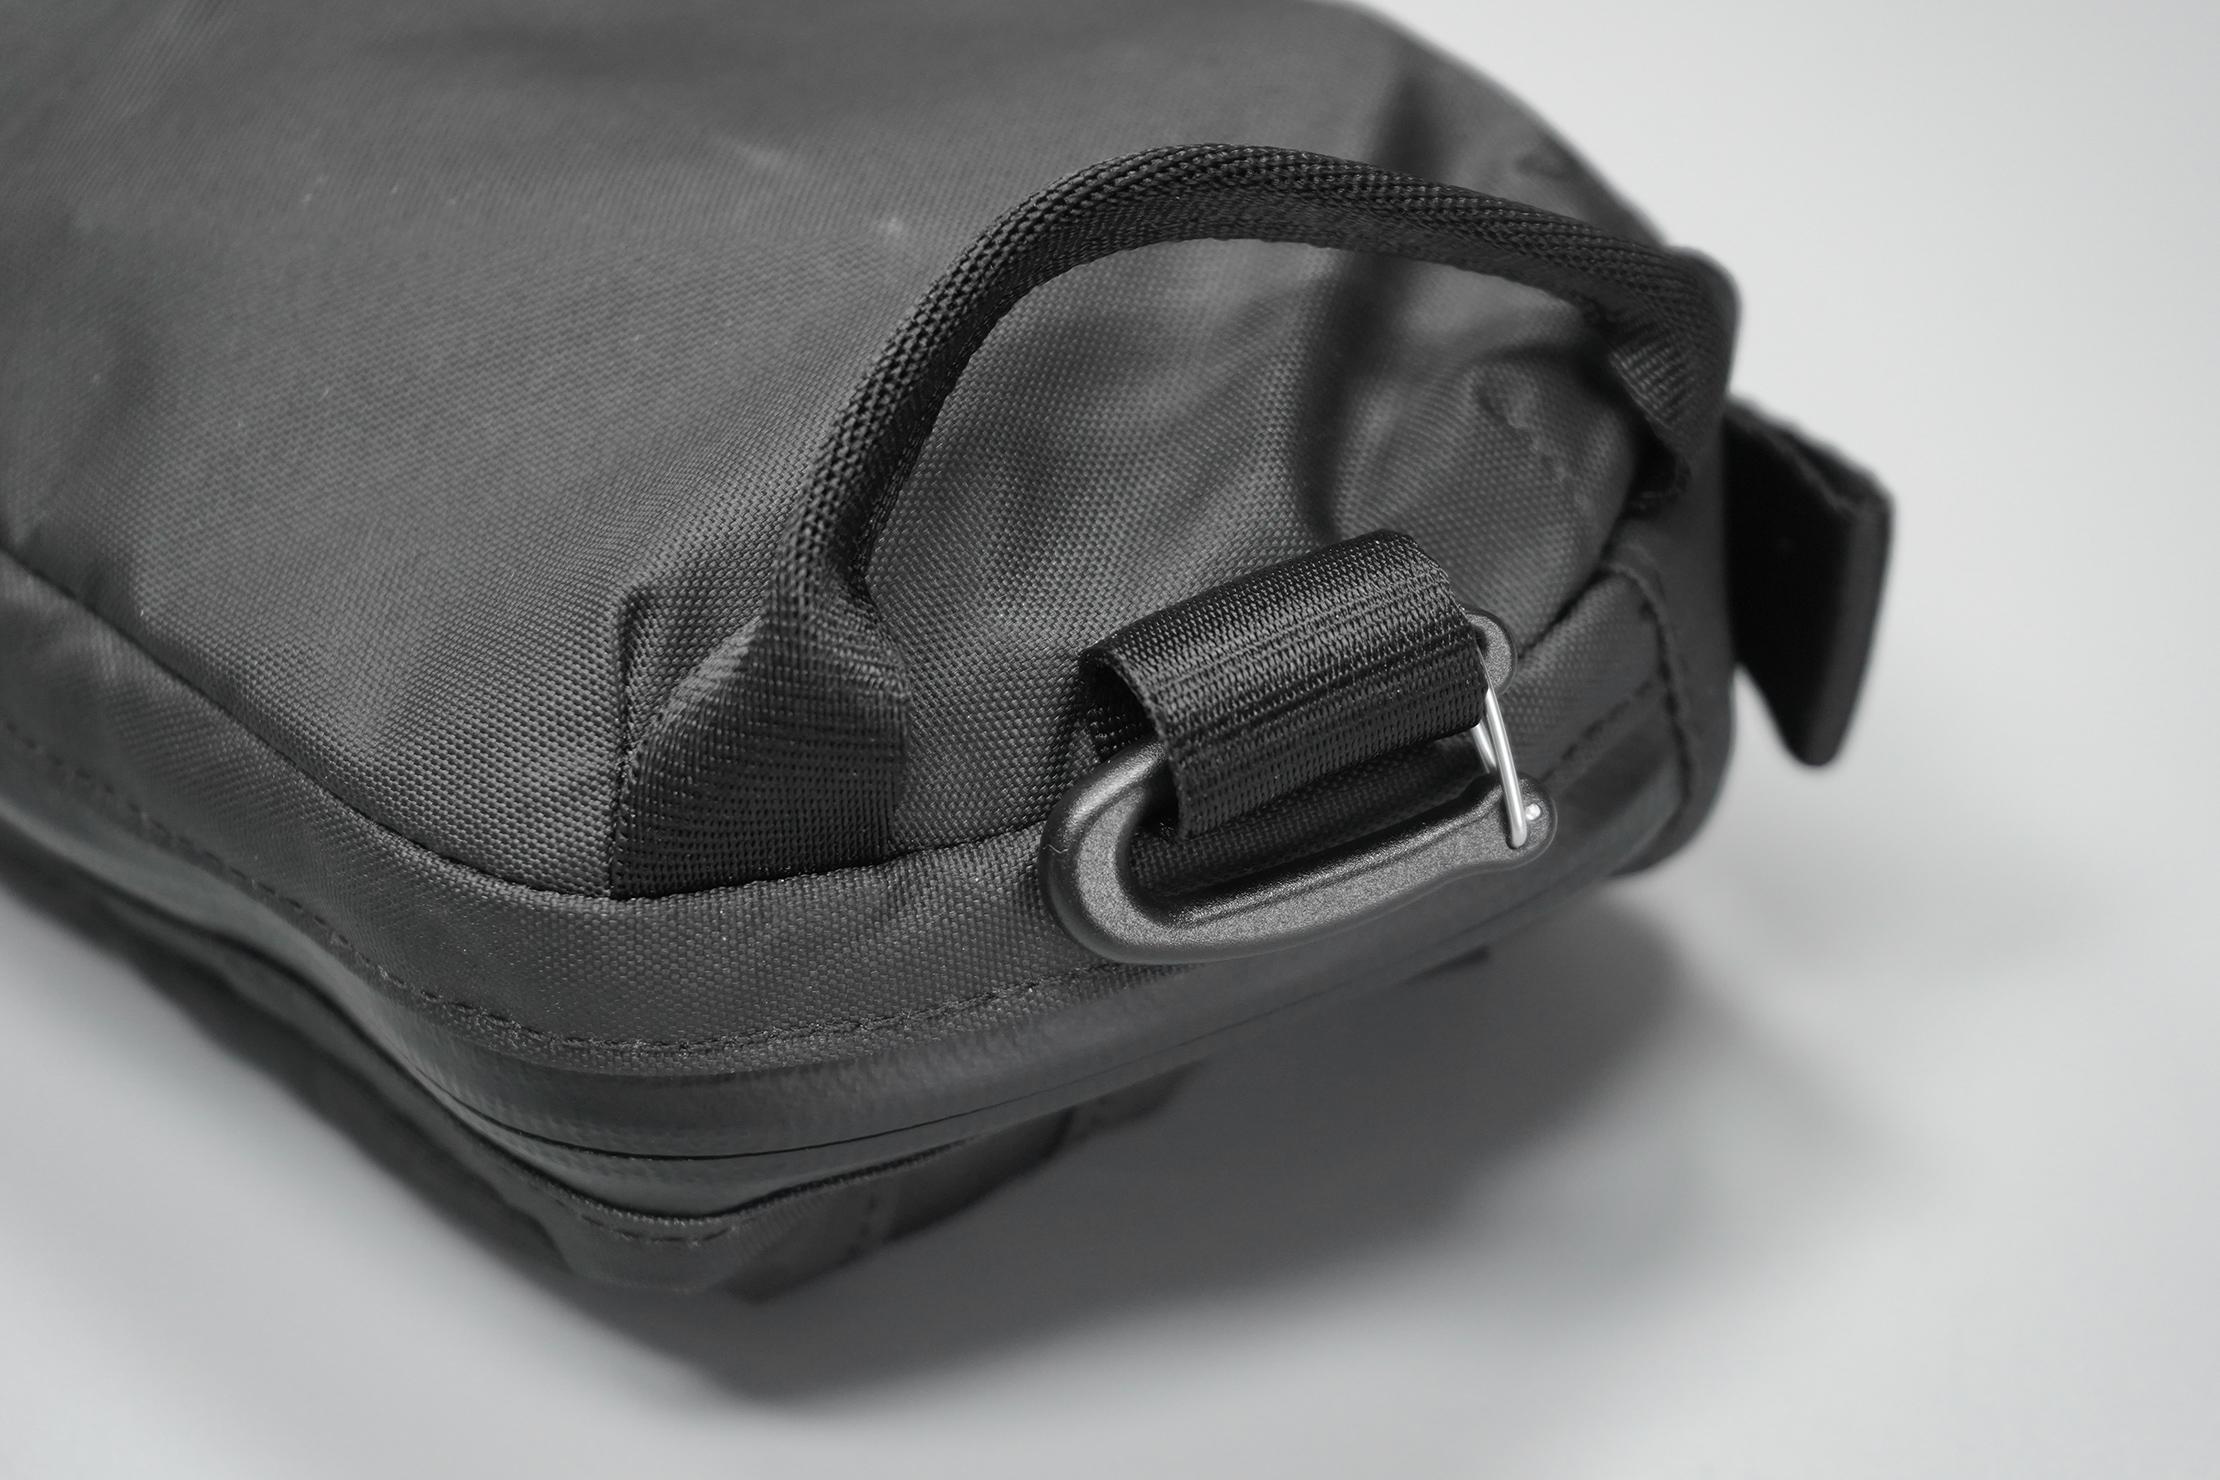 WANDRD Toiletry Bag gatekeeper clip